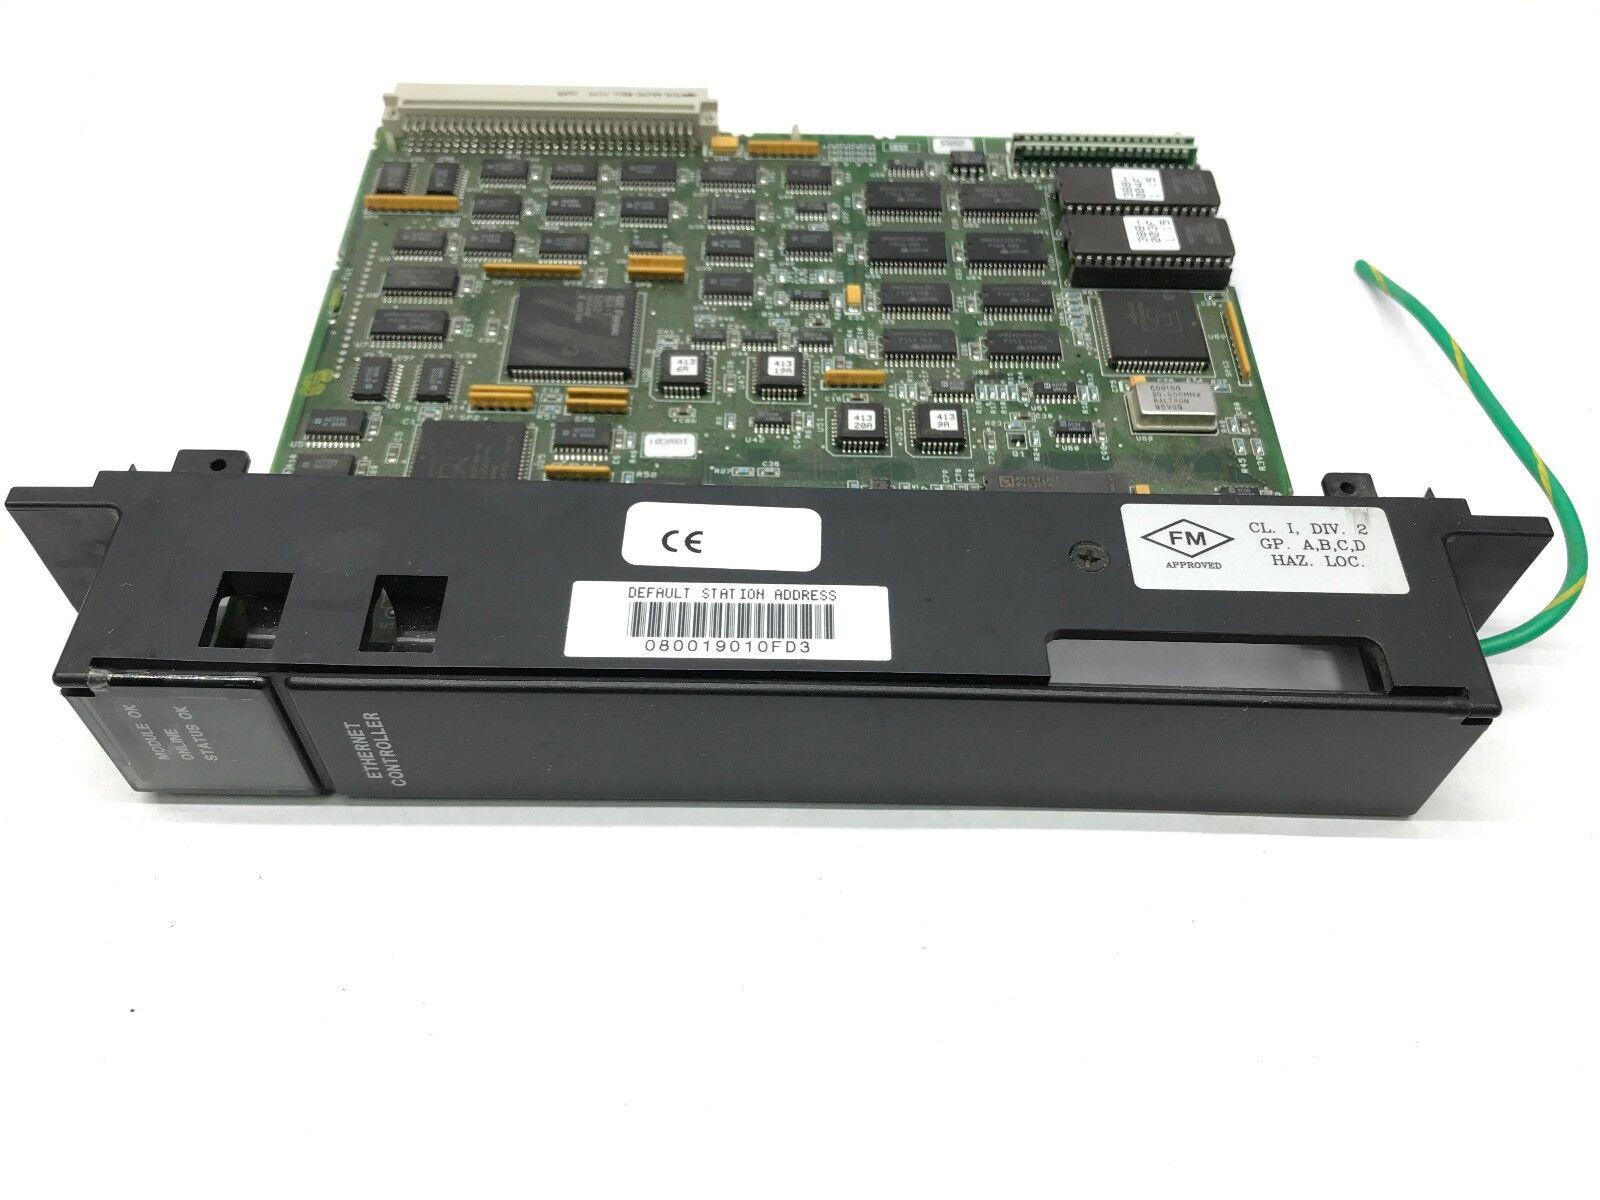 GE Fanuc IC697CMM741J Ethernet Controller IC697CMM741